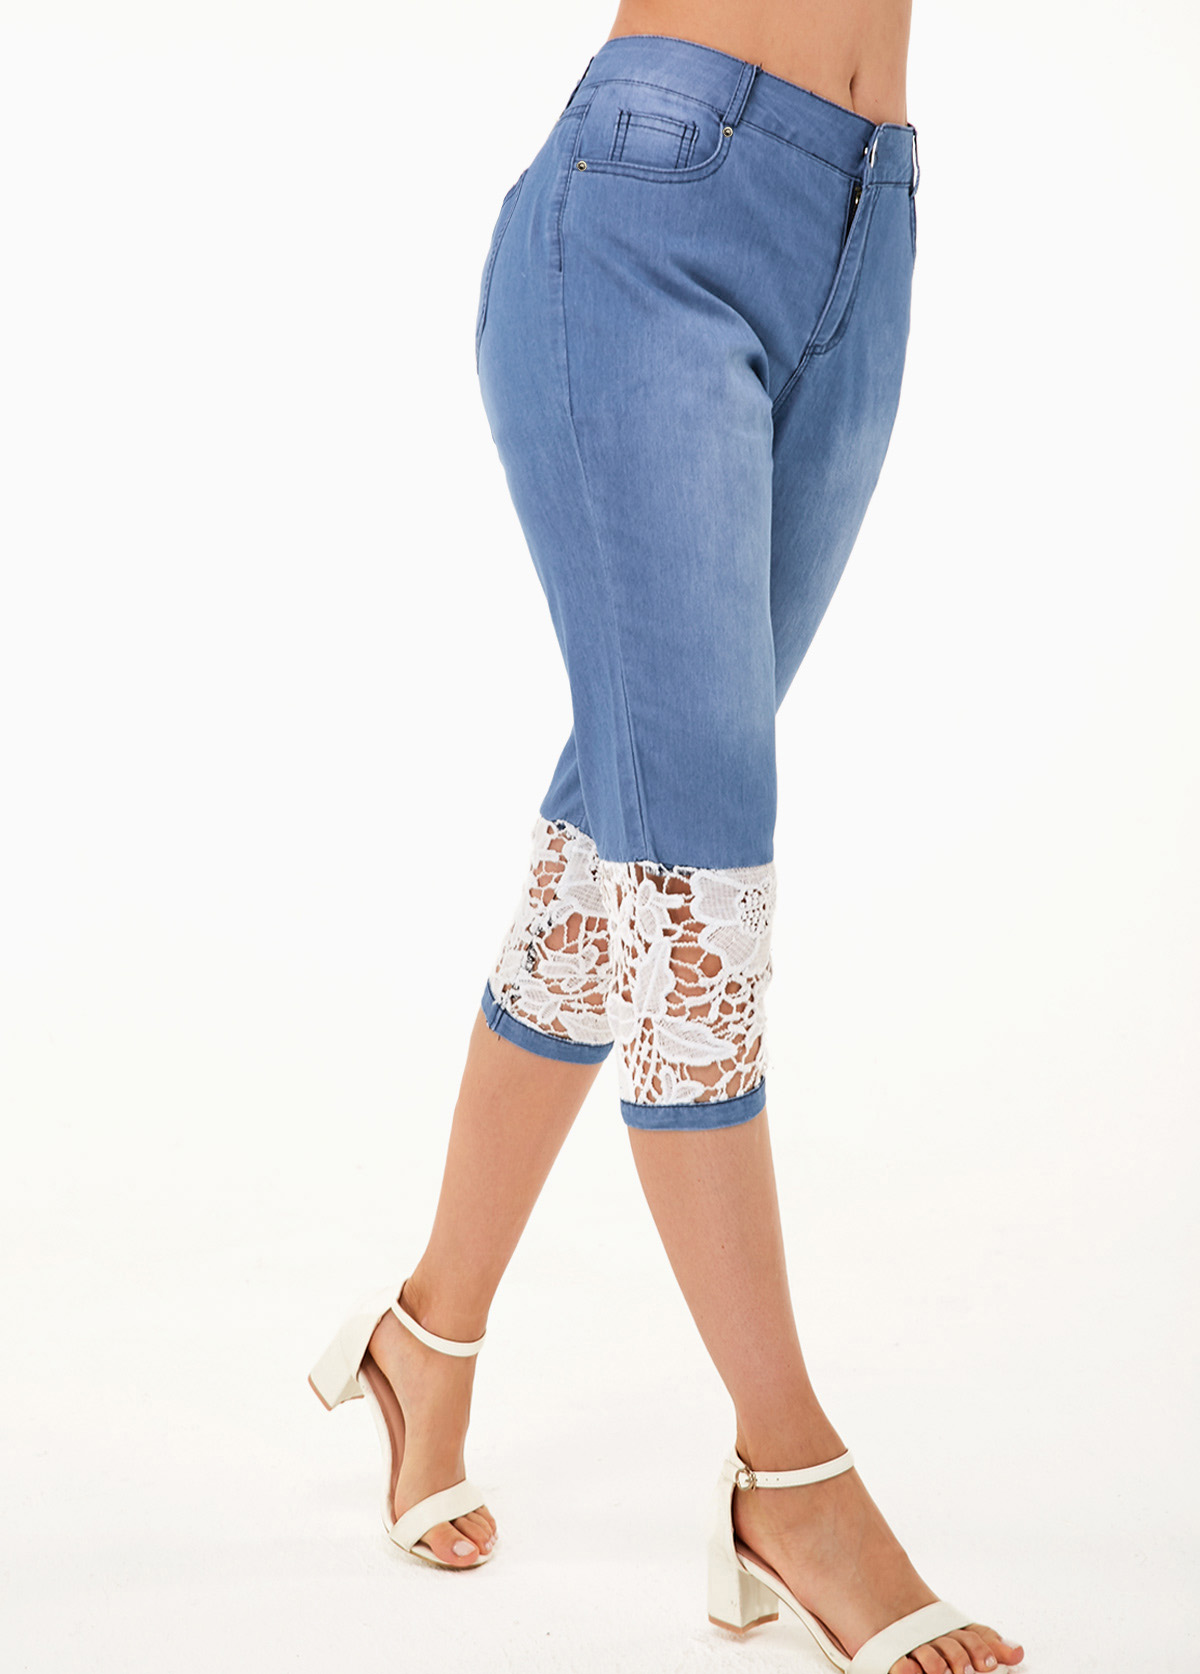 ROTITA Contrast Design Lace Panel Denim Blue Jeans